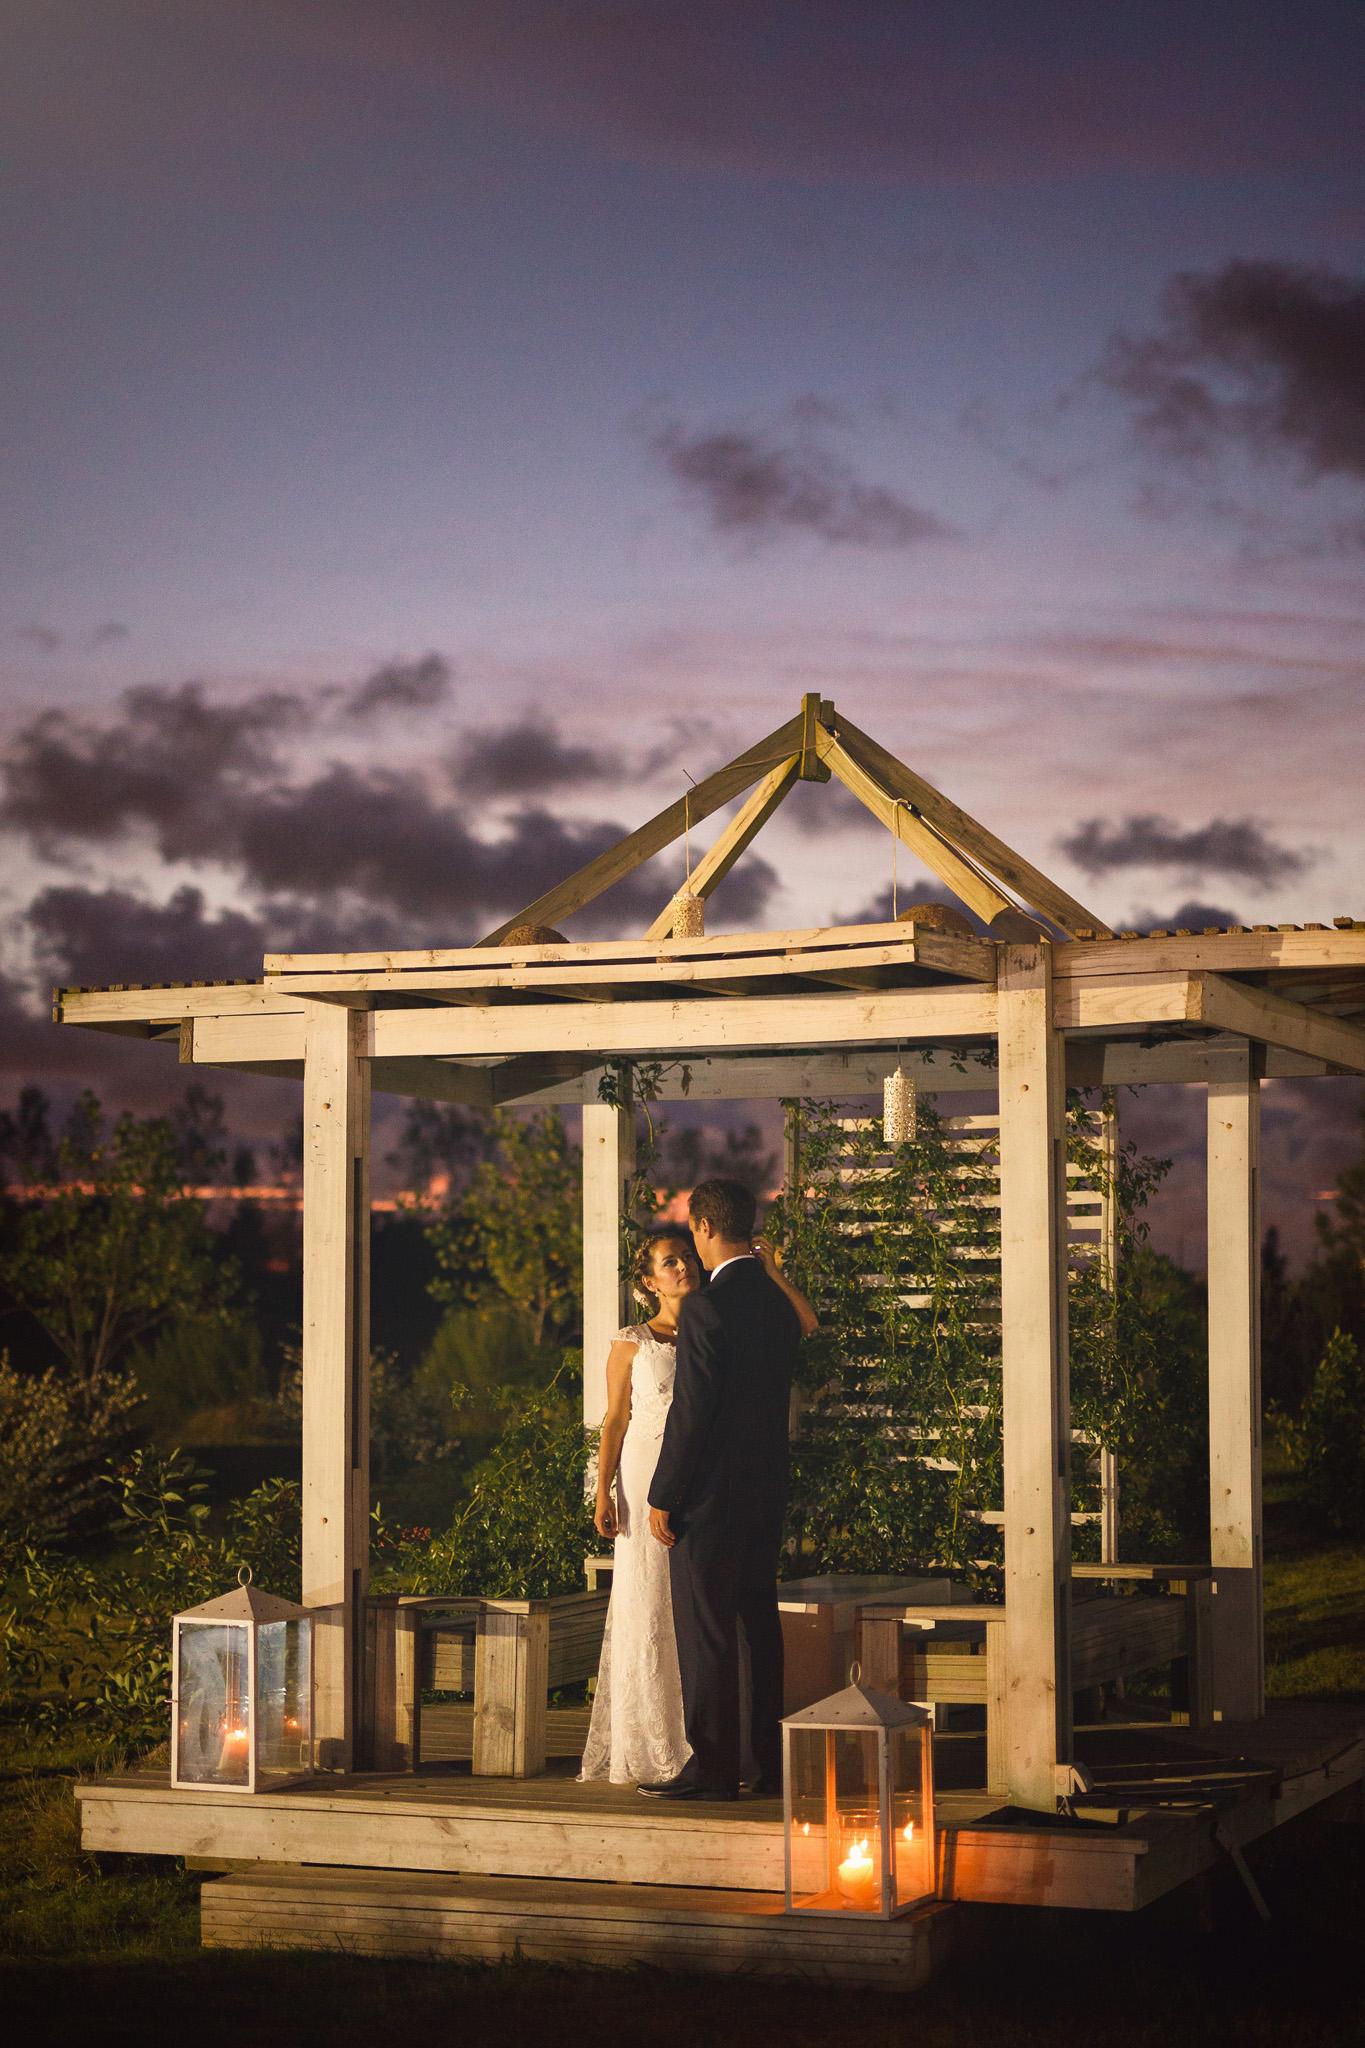 Wedding_Travellers_Destination_Wedding_Photography-77.jpg